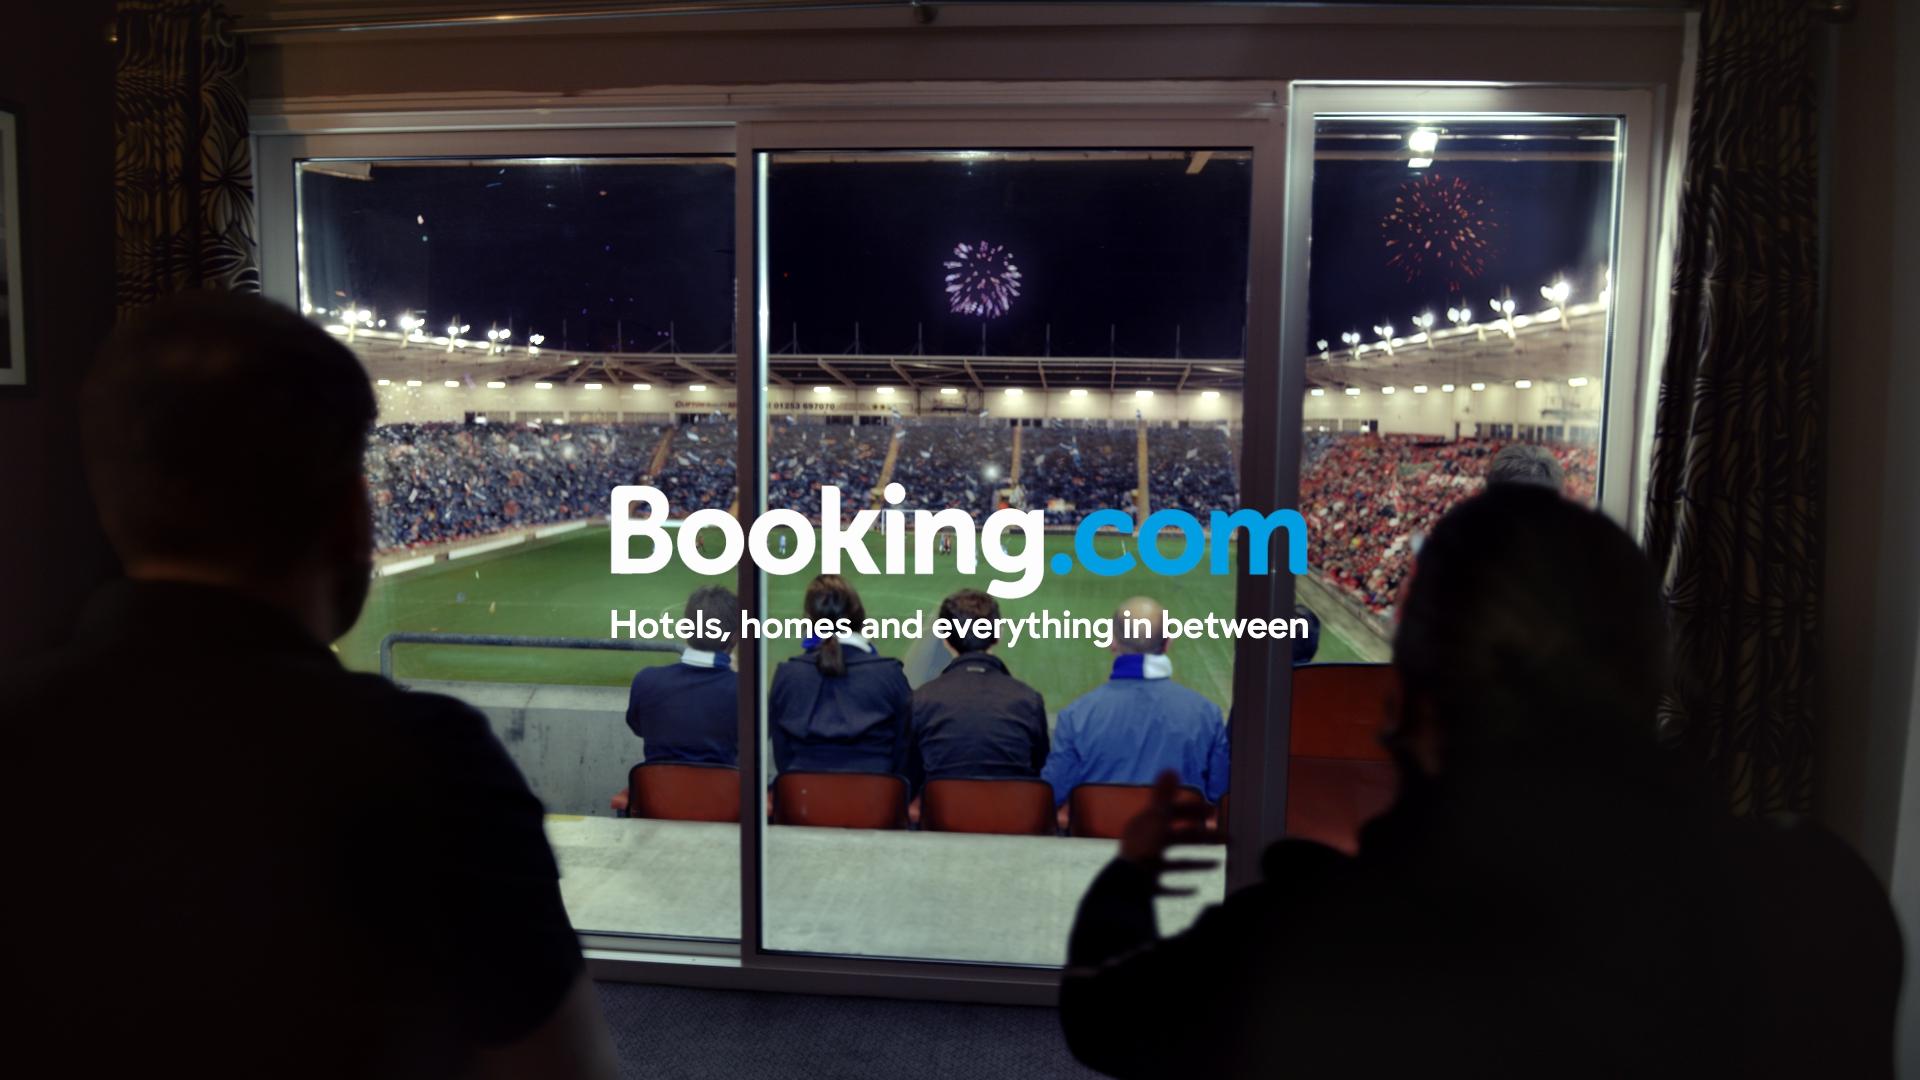 Booking.com Thierry Henry uefa euro 2016 publicité